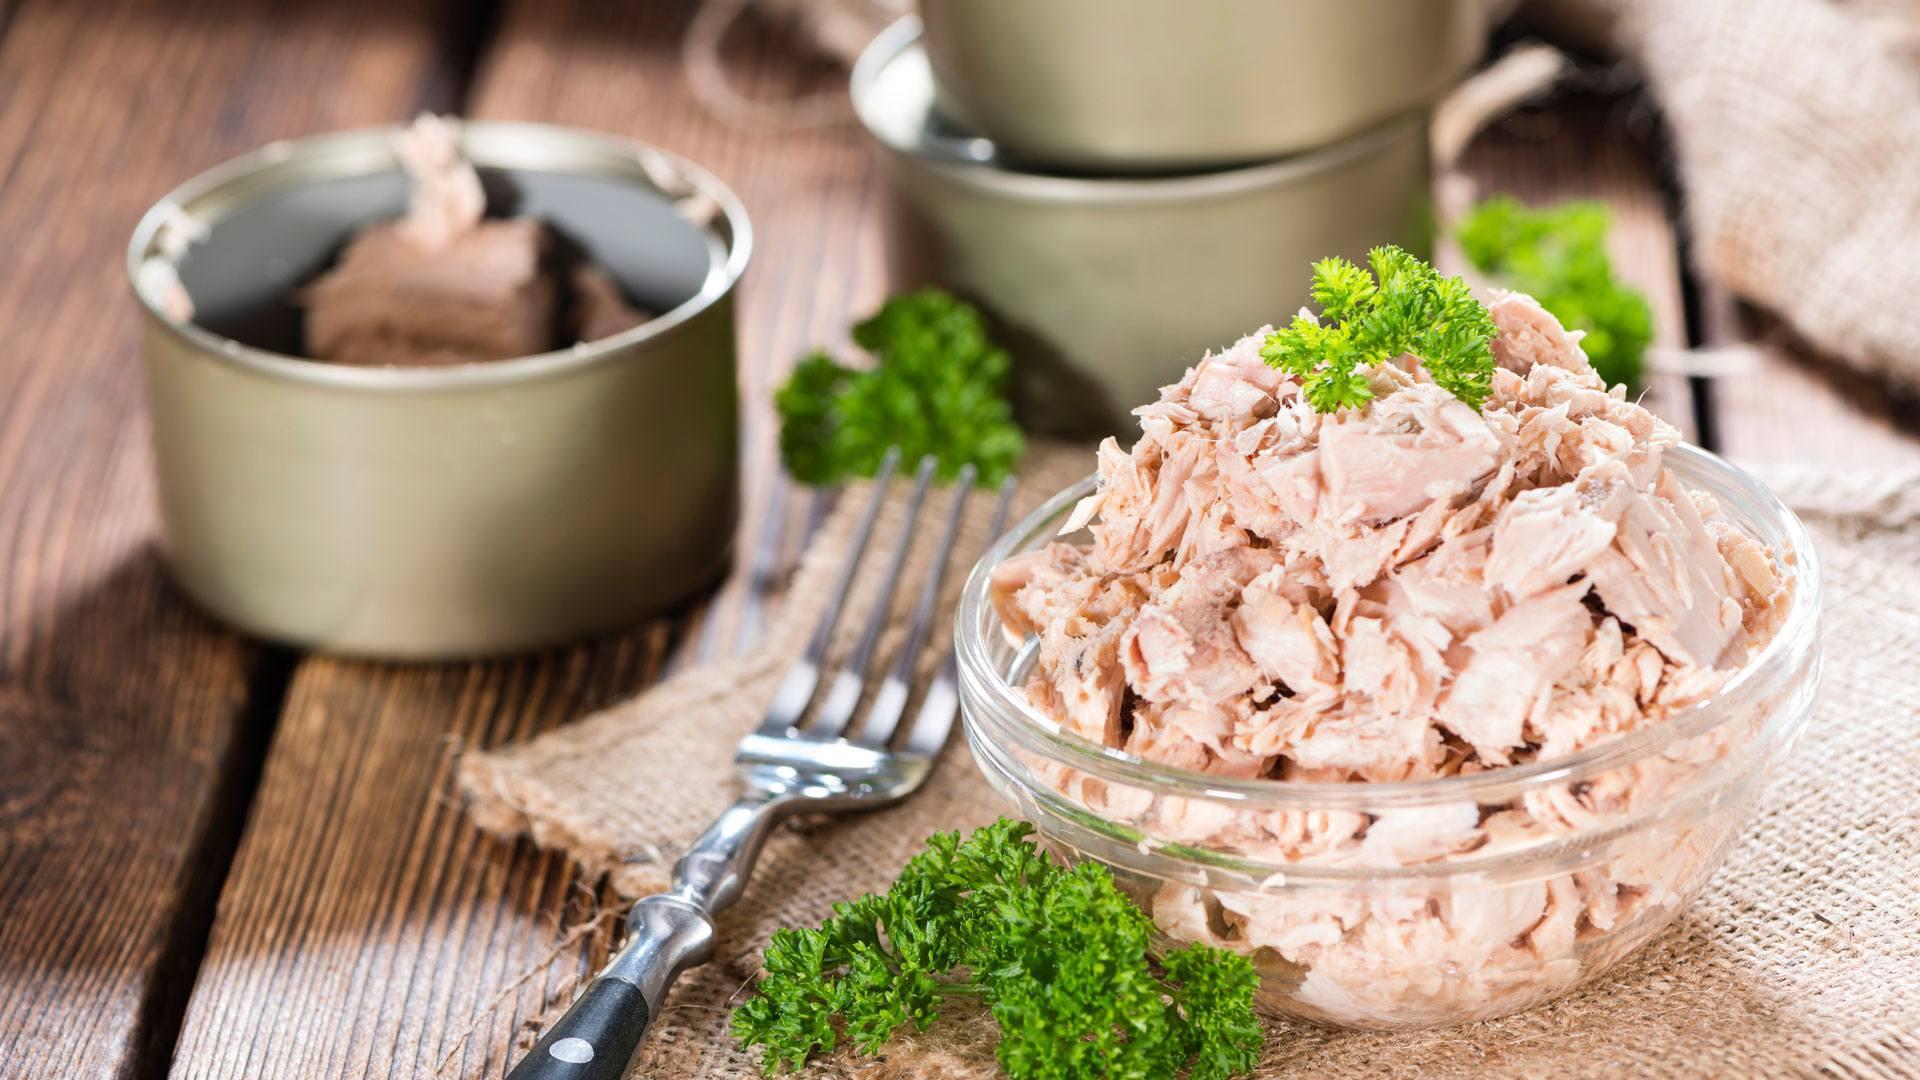 Vital Choice canned salmon recipes